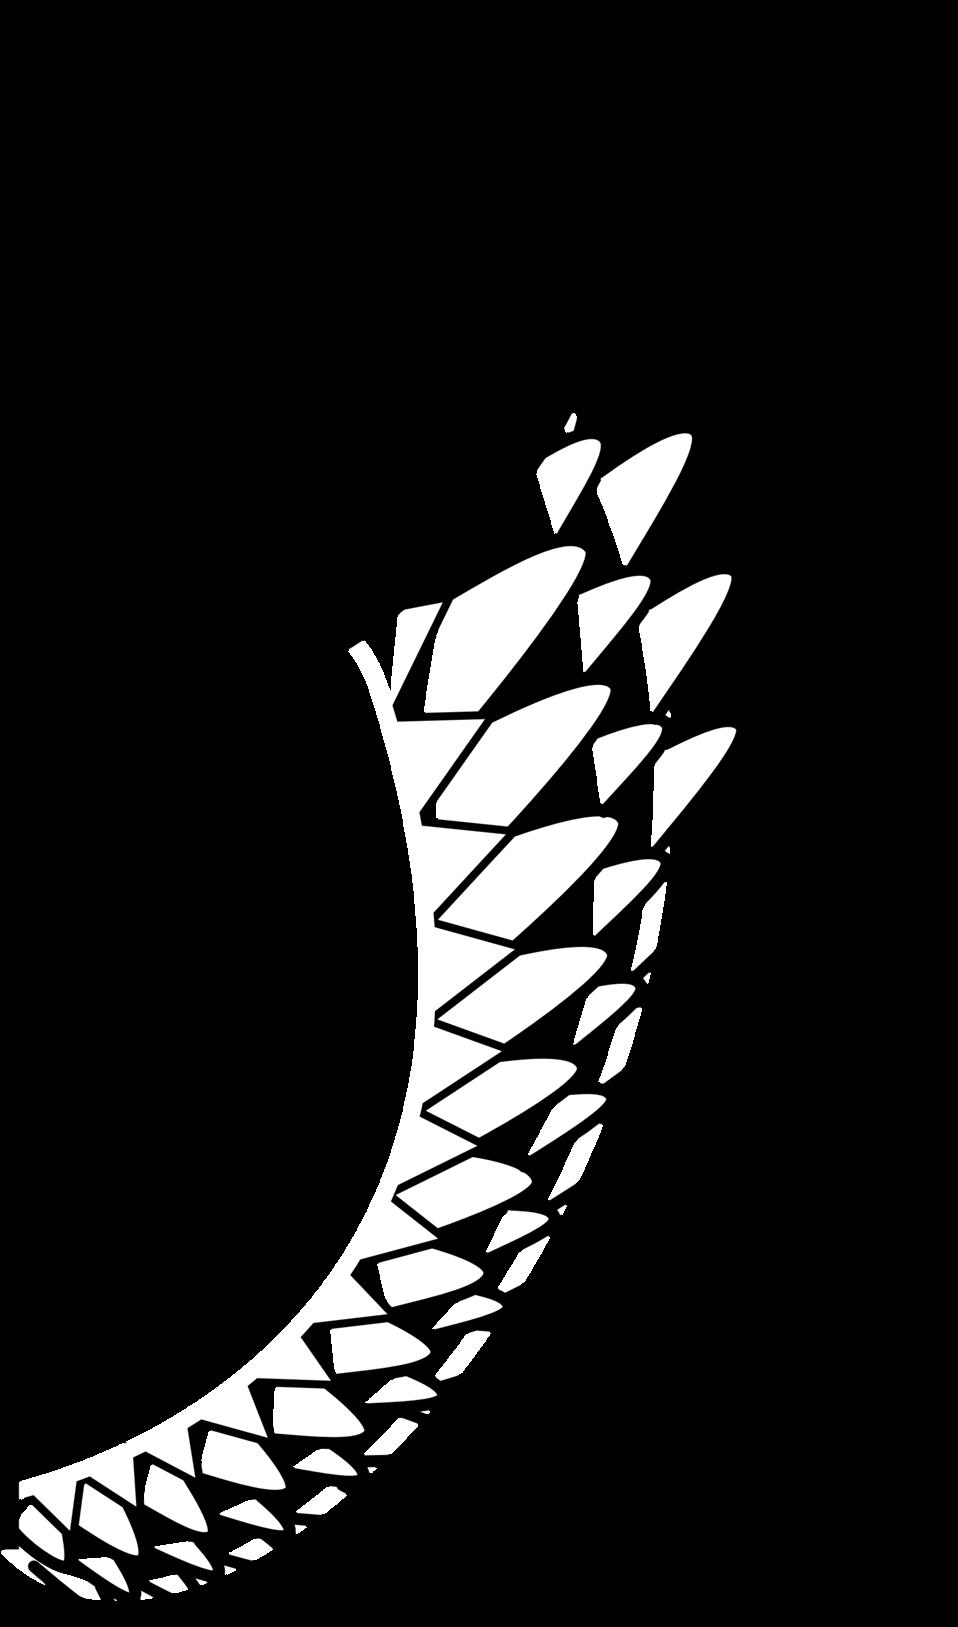 Public domain clip art. Wing clipart bird wing